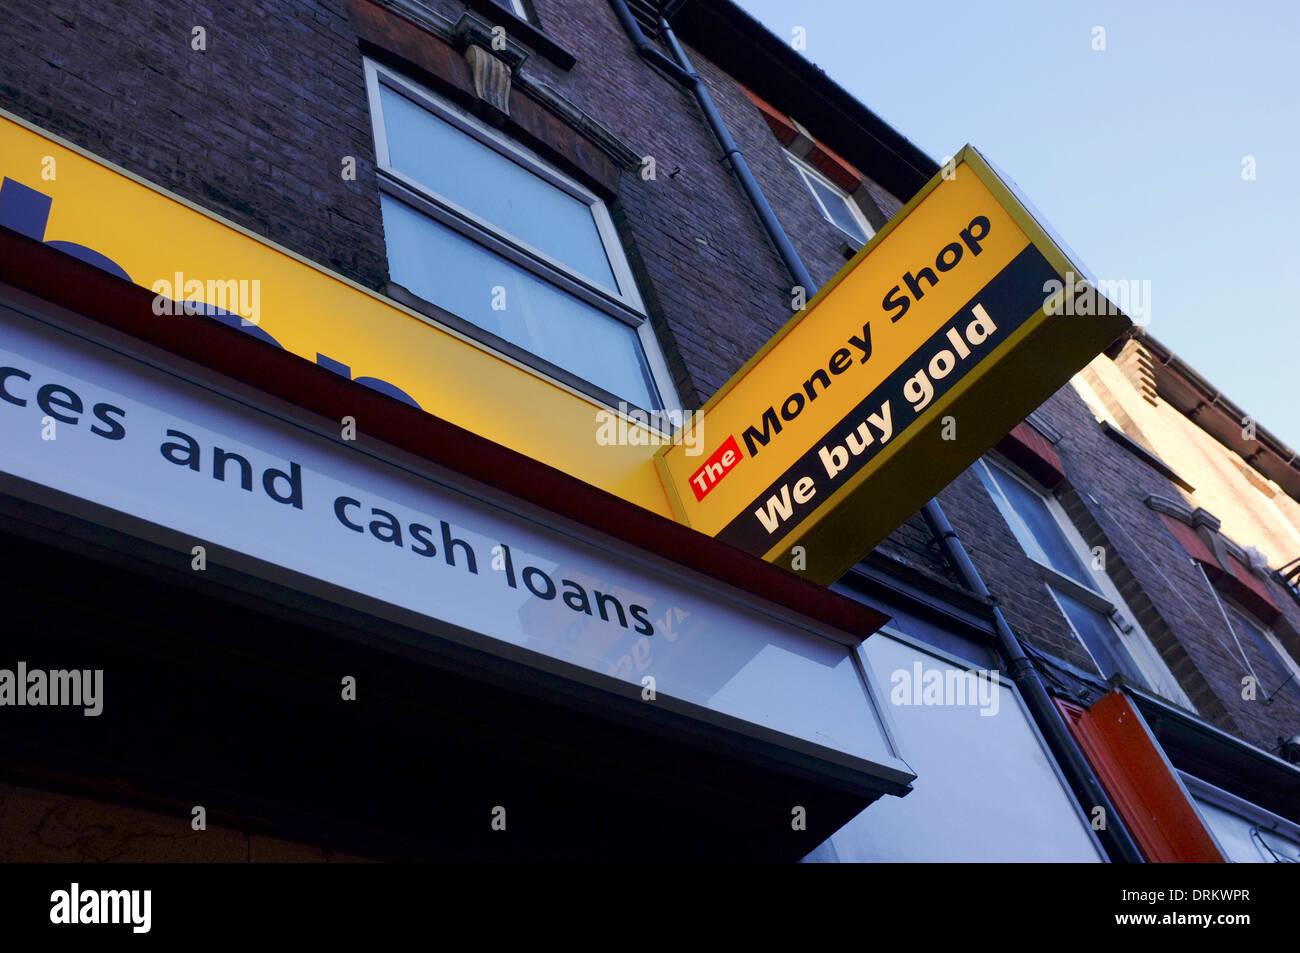 Rapid cash payday loans winter haven fl photo 7